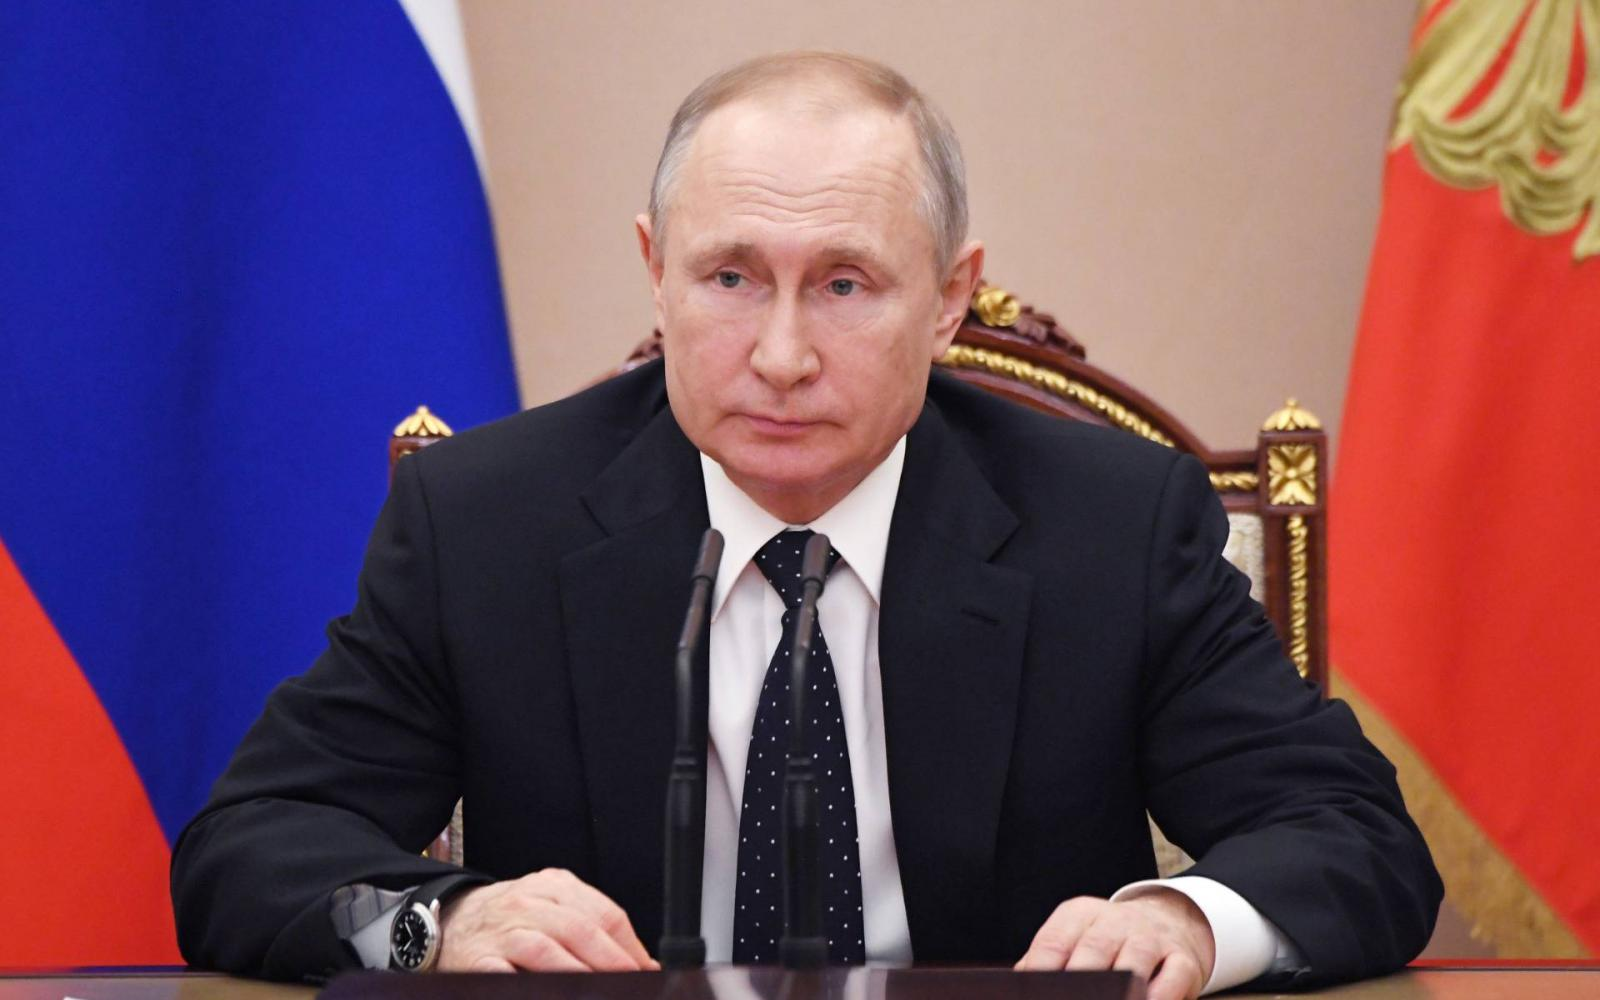 hogyan keresett pénzt Putyin